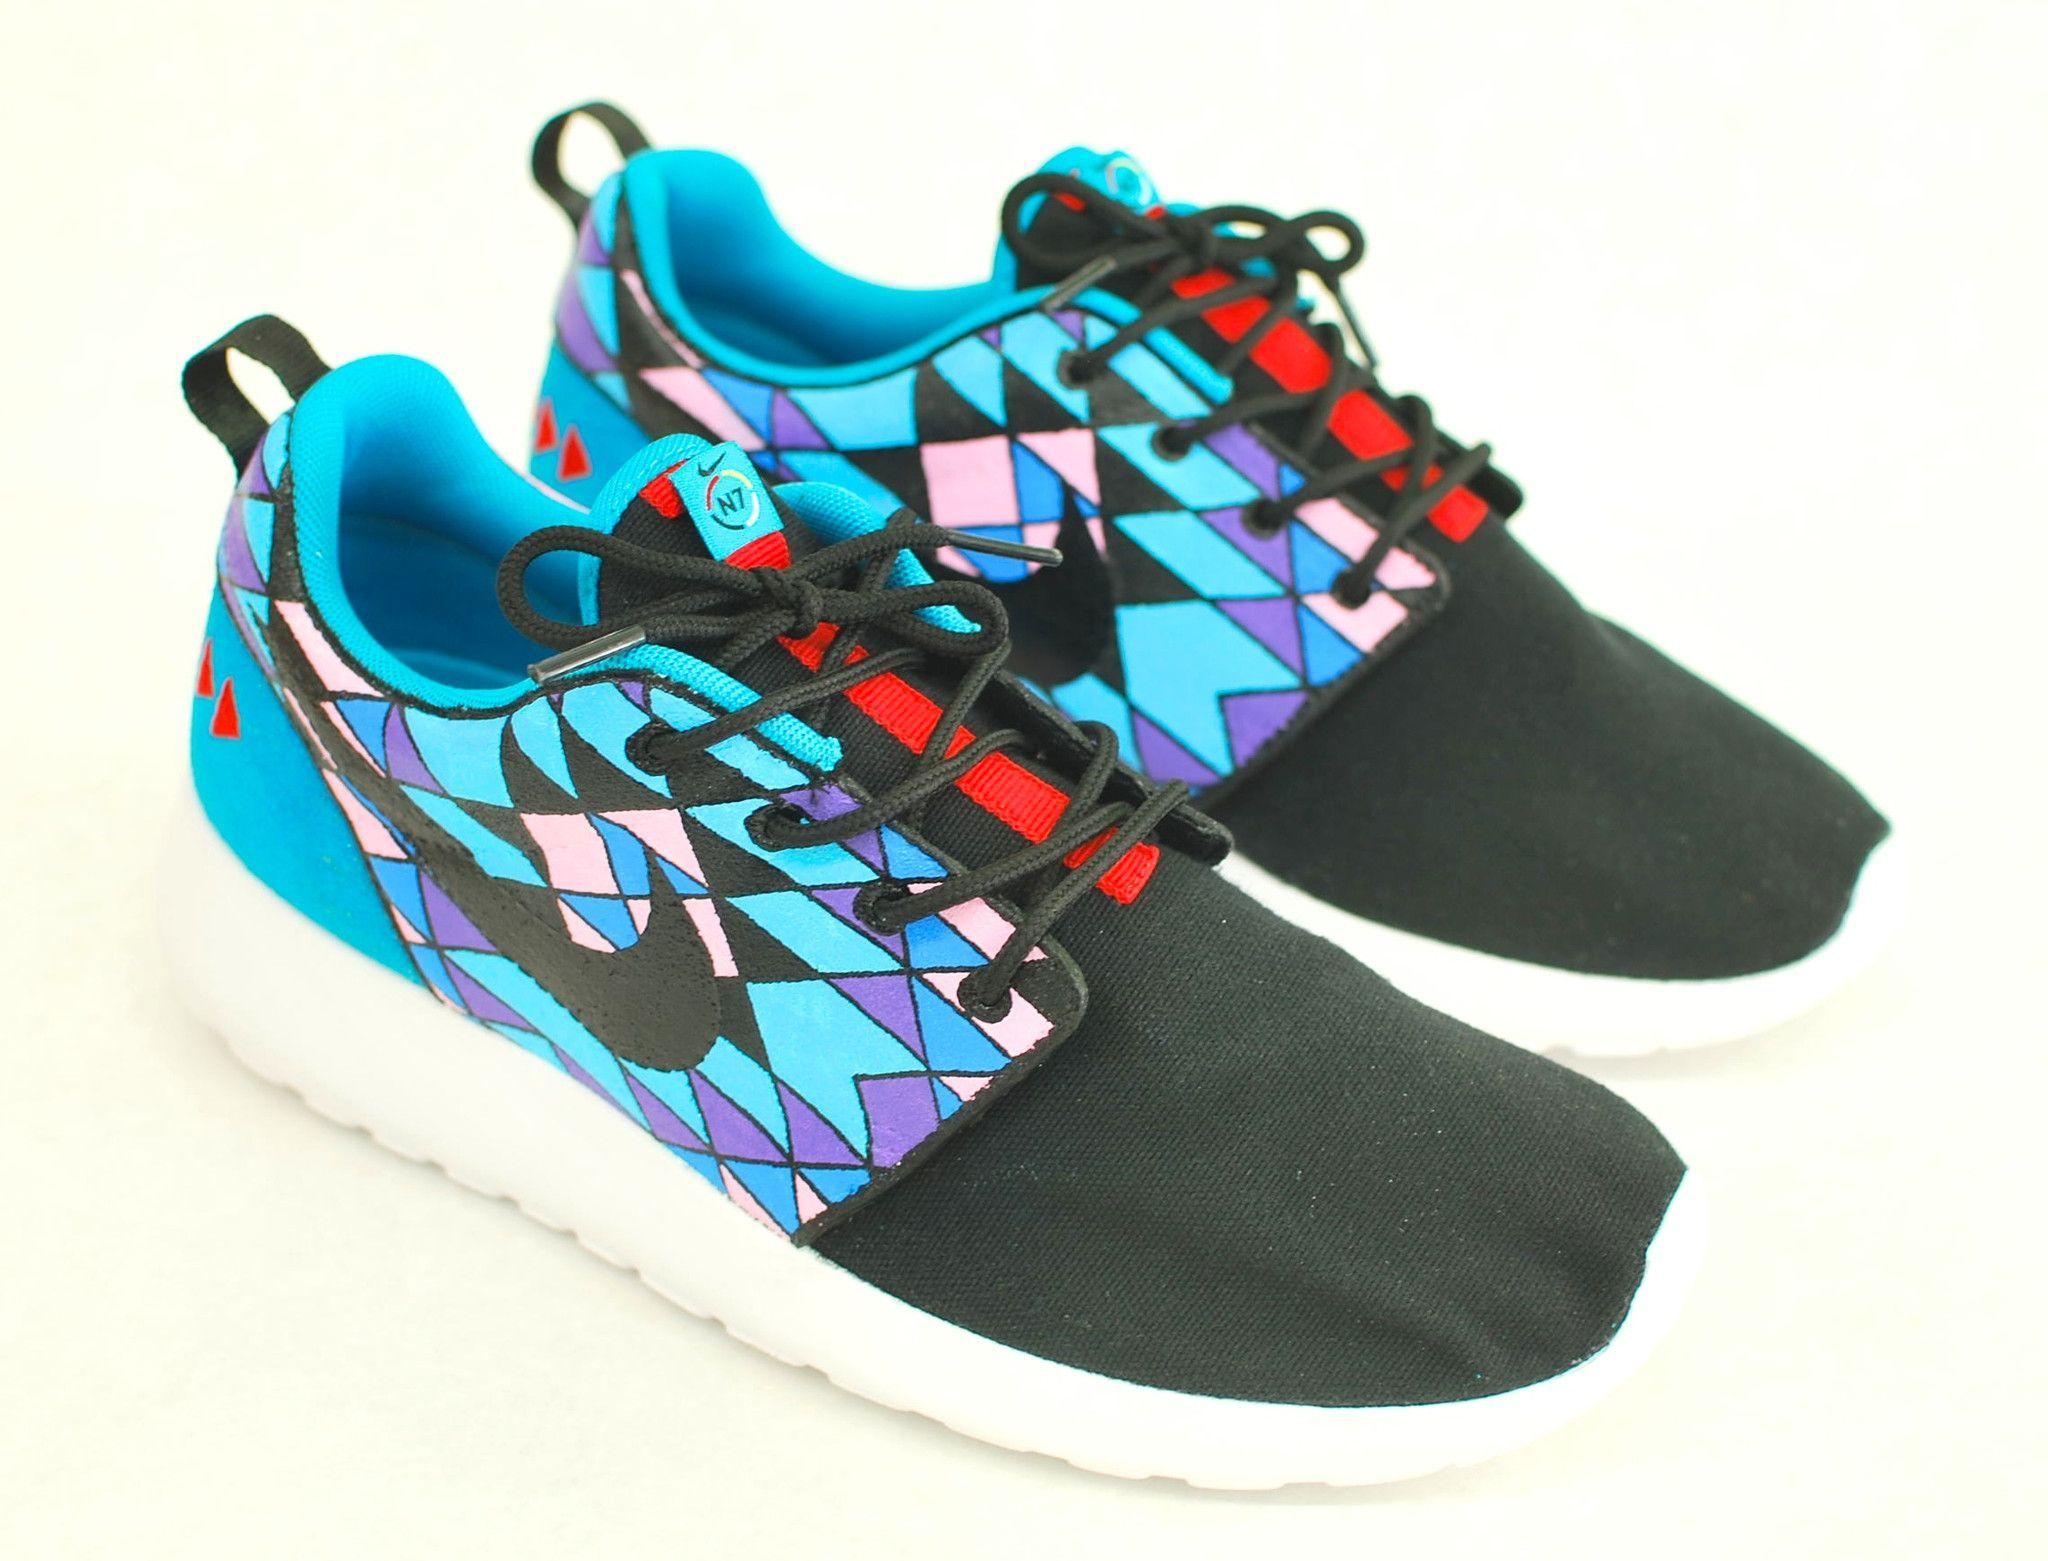 These custom hand-painted Nike Roshe